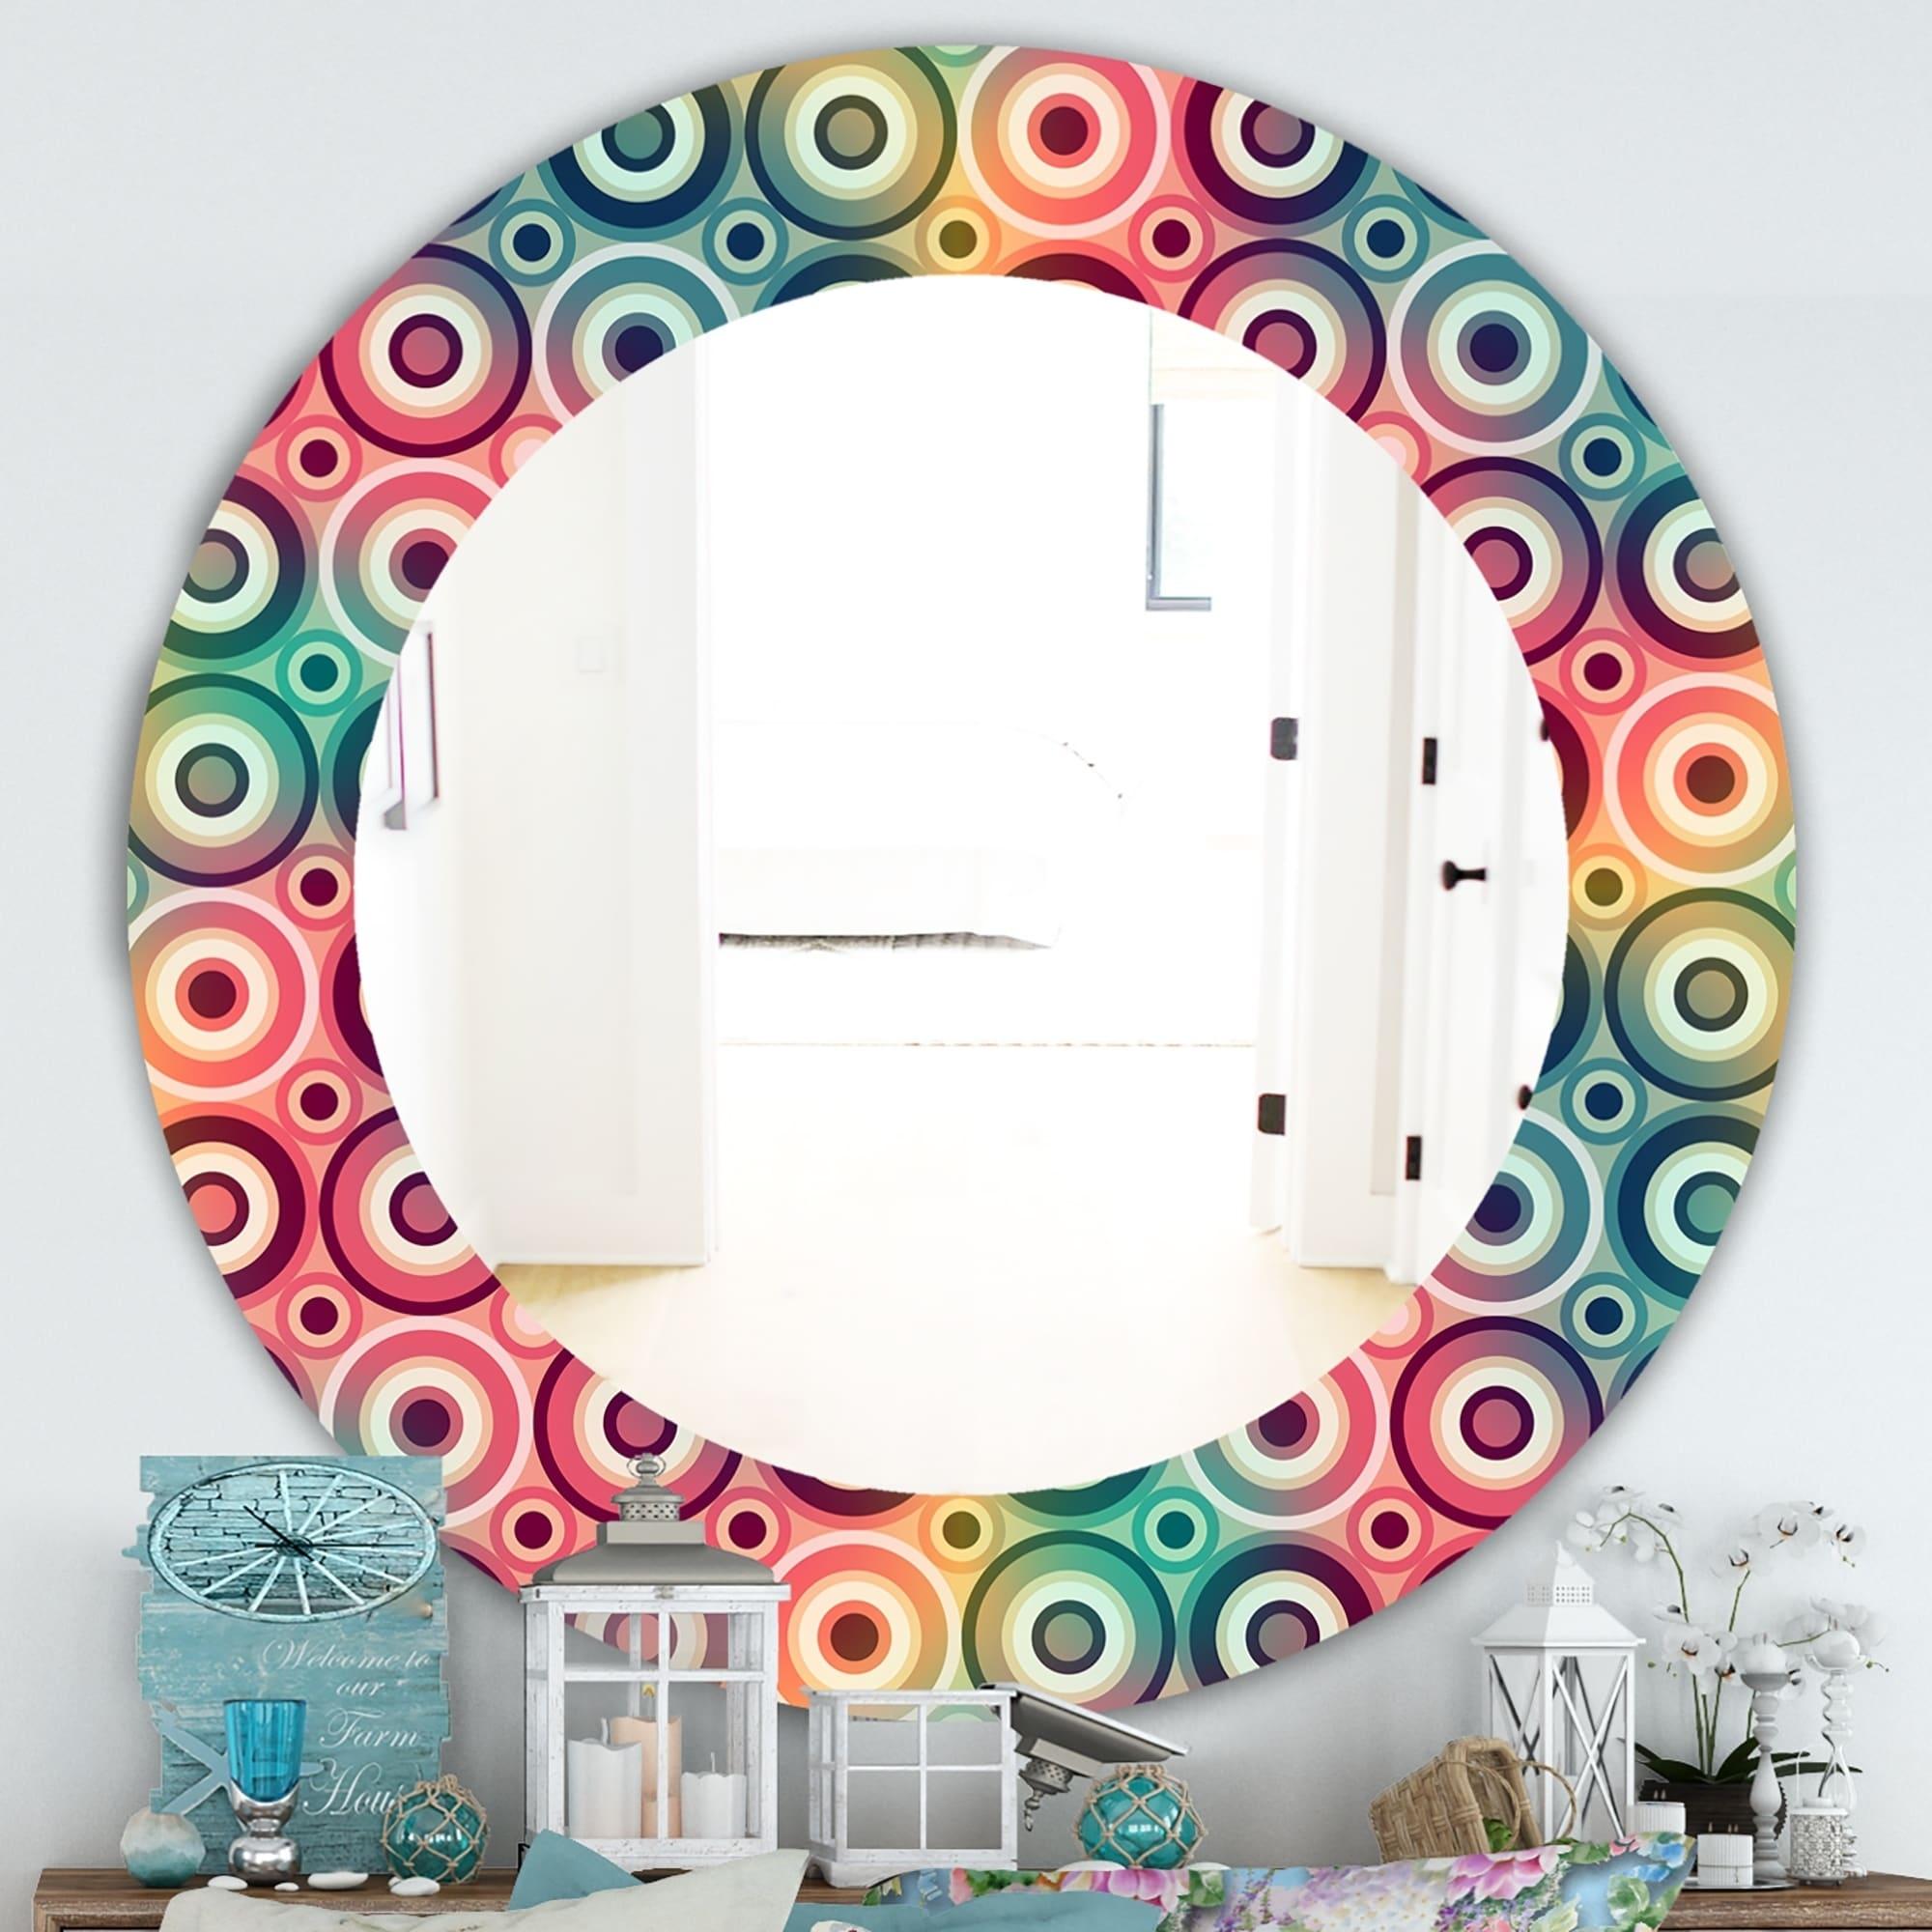 Shop Designart Circular Dance 8 Modern Bathroom Mirror Frameless Contemporary Oval Or Round Wall Mirror On Sale Overstock 28001085